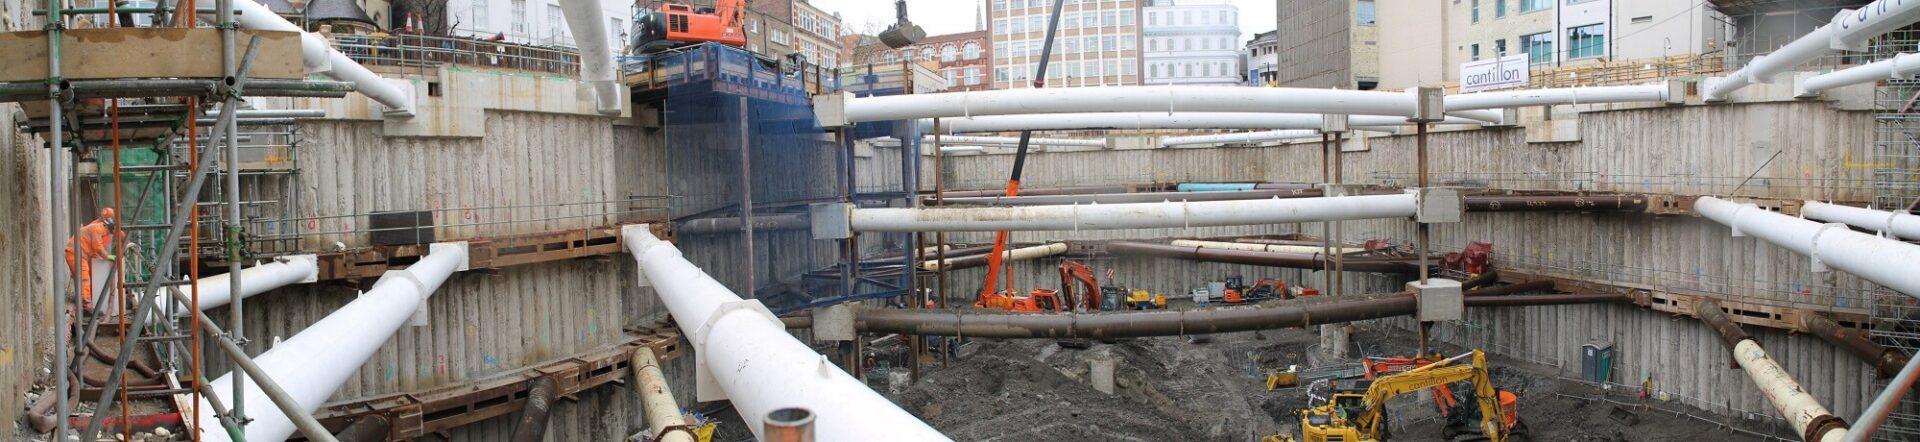 Retaining Wall Solution - Ilona Rose House, Tottenham Court Road - LDA piling Secant Wall Basement (2)